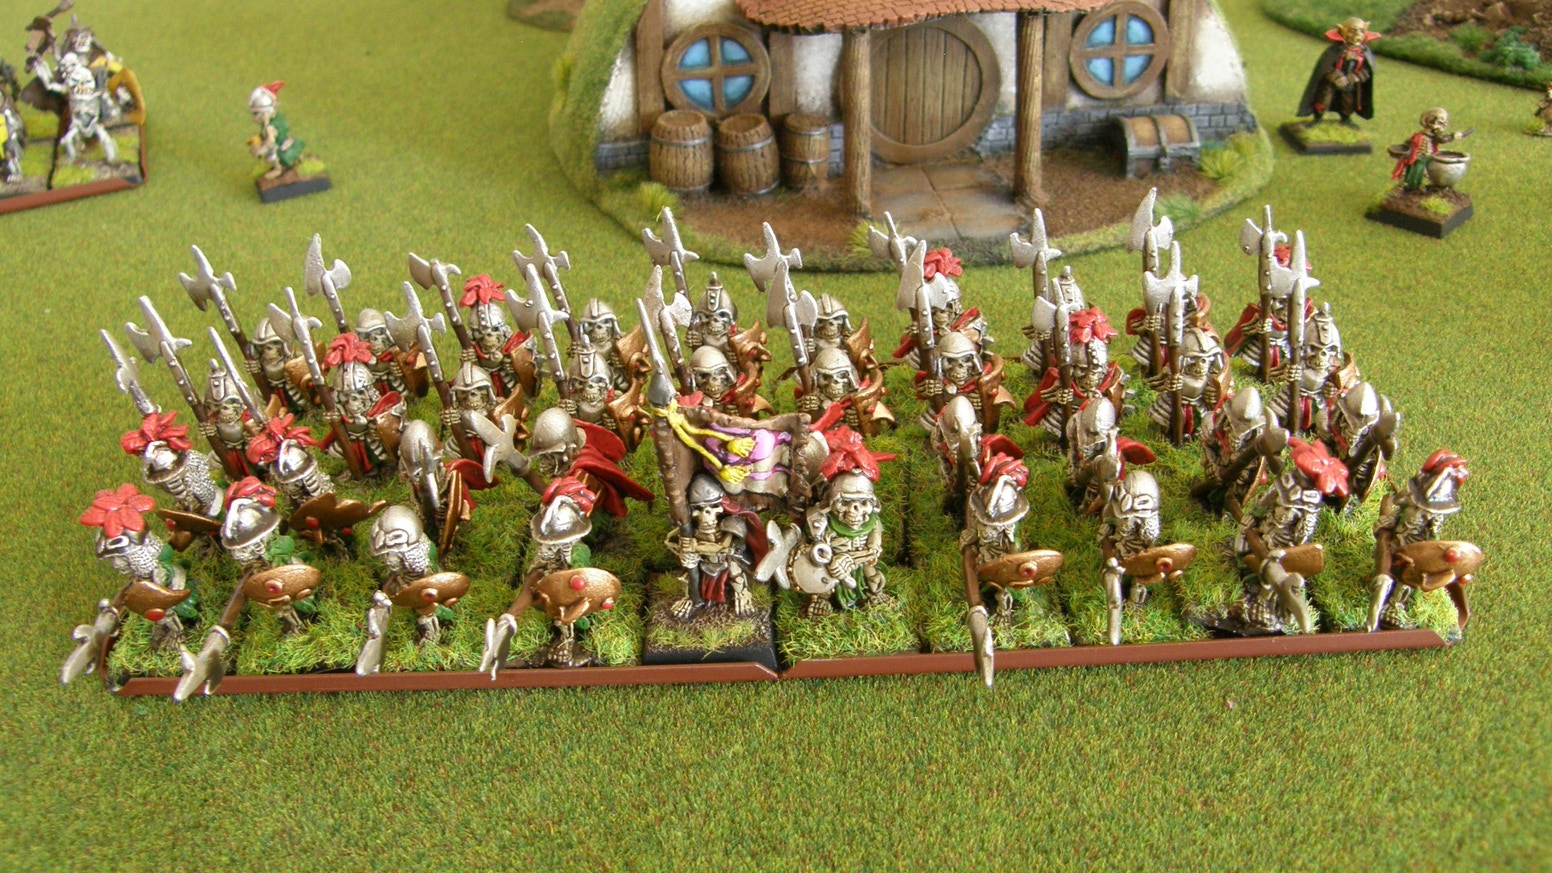 Halfling Skeleton Army Halberds and War Machine Crew by John